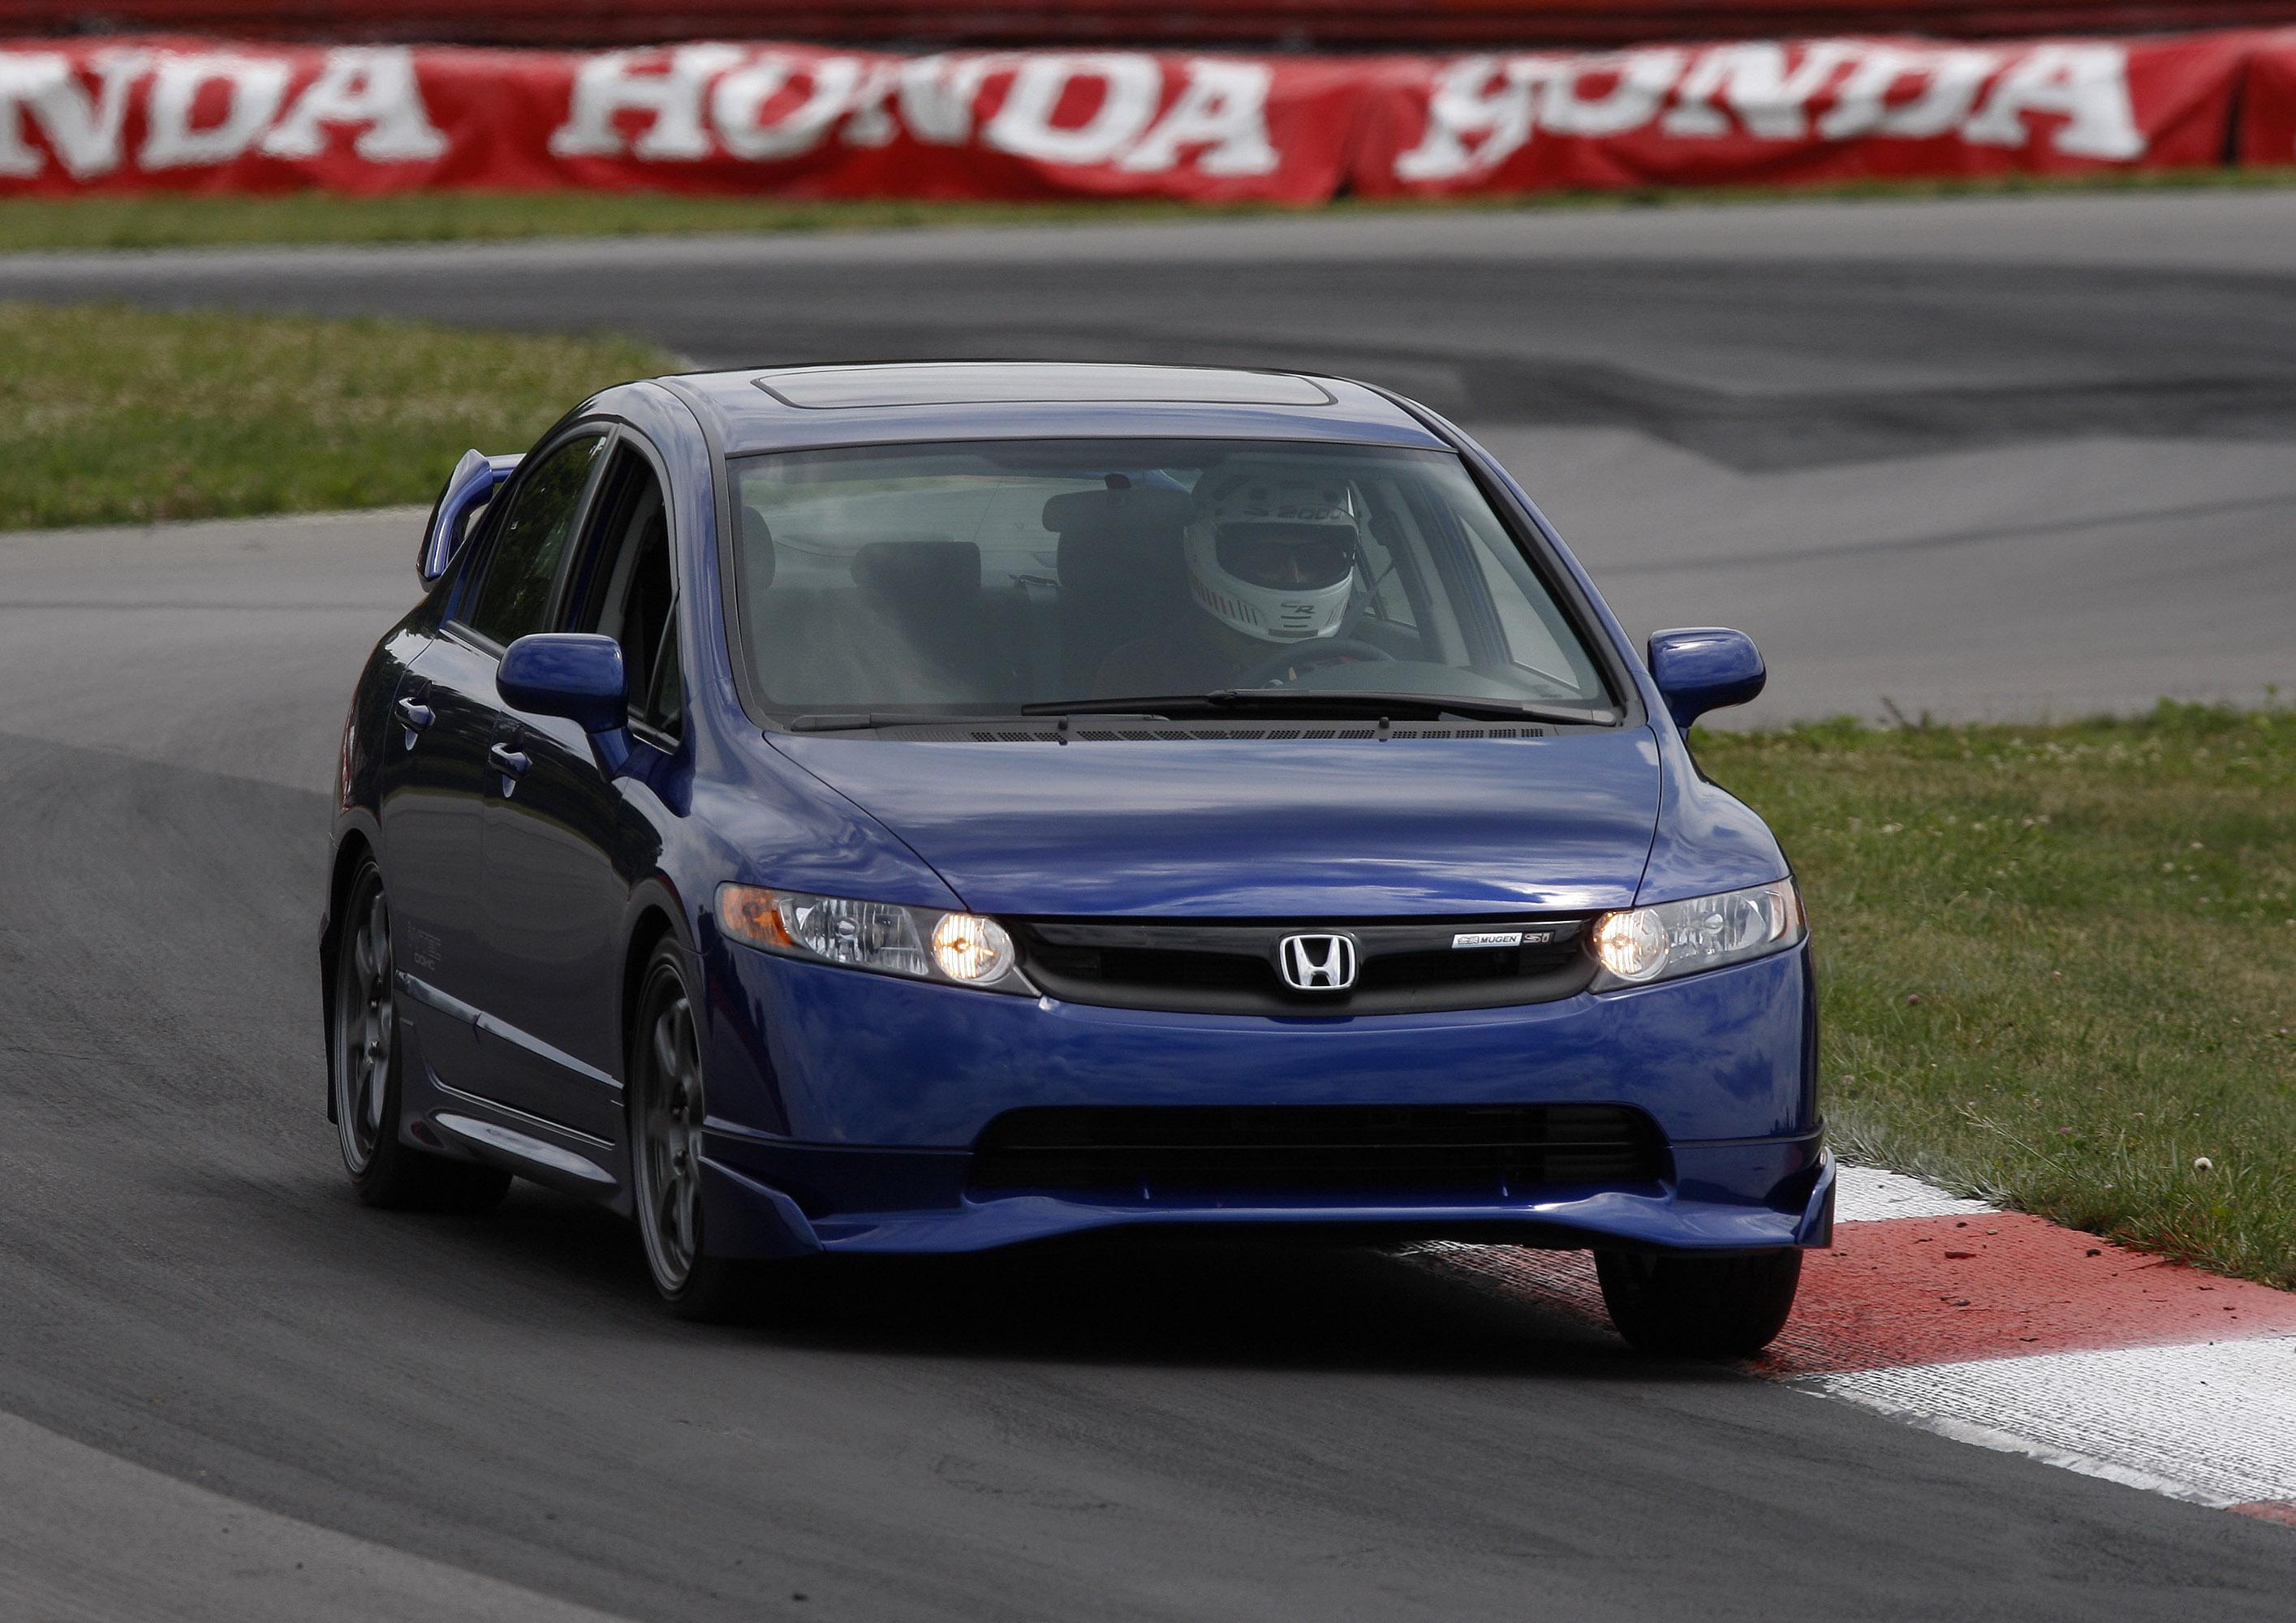 2008 Honda Civic Mugen Si Sedan Hd Pictures